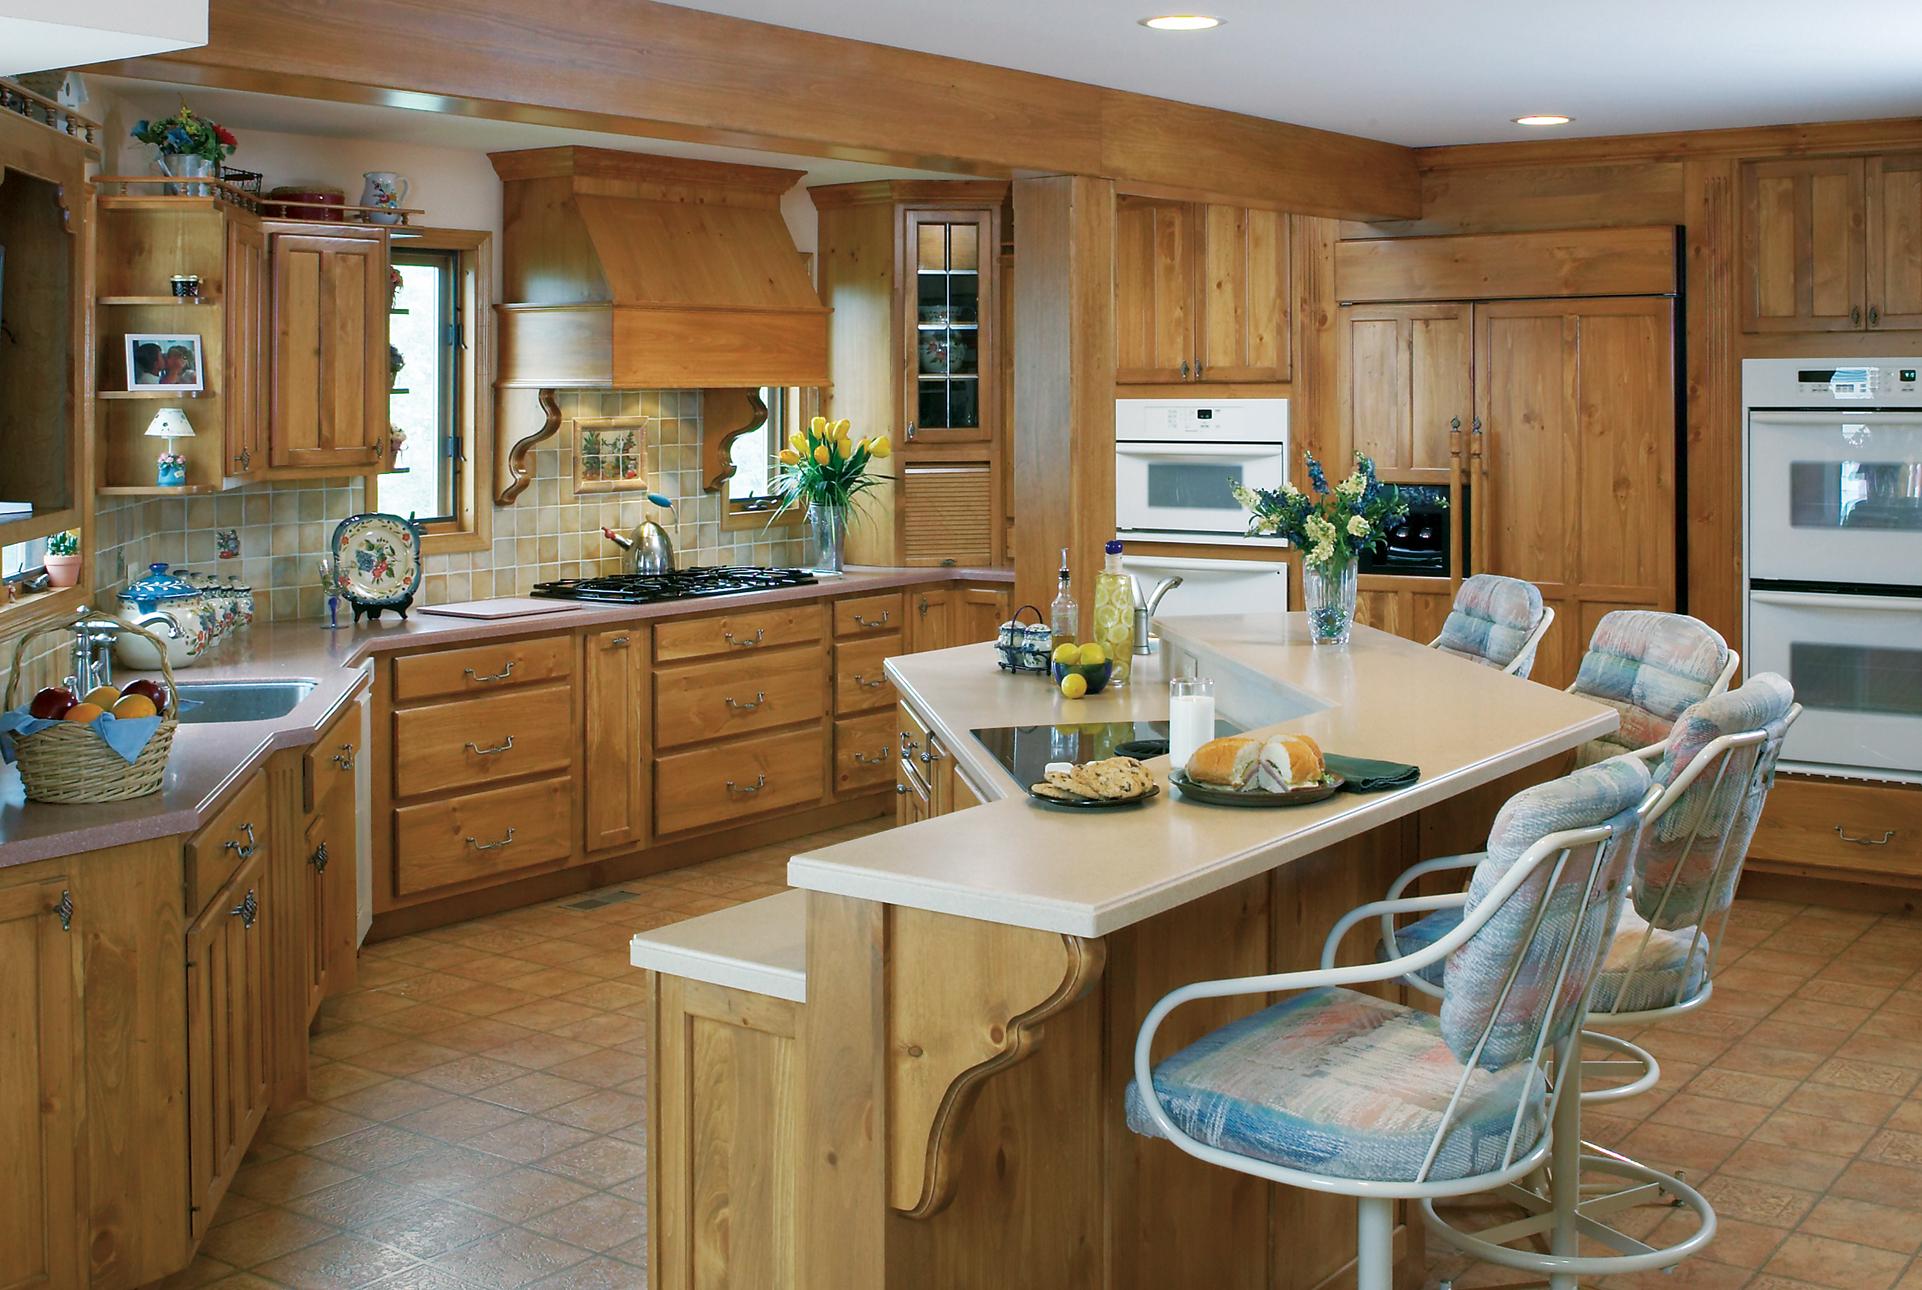 Kitchen decor sets – Kitchen ideas